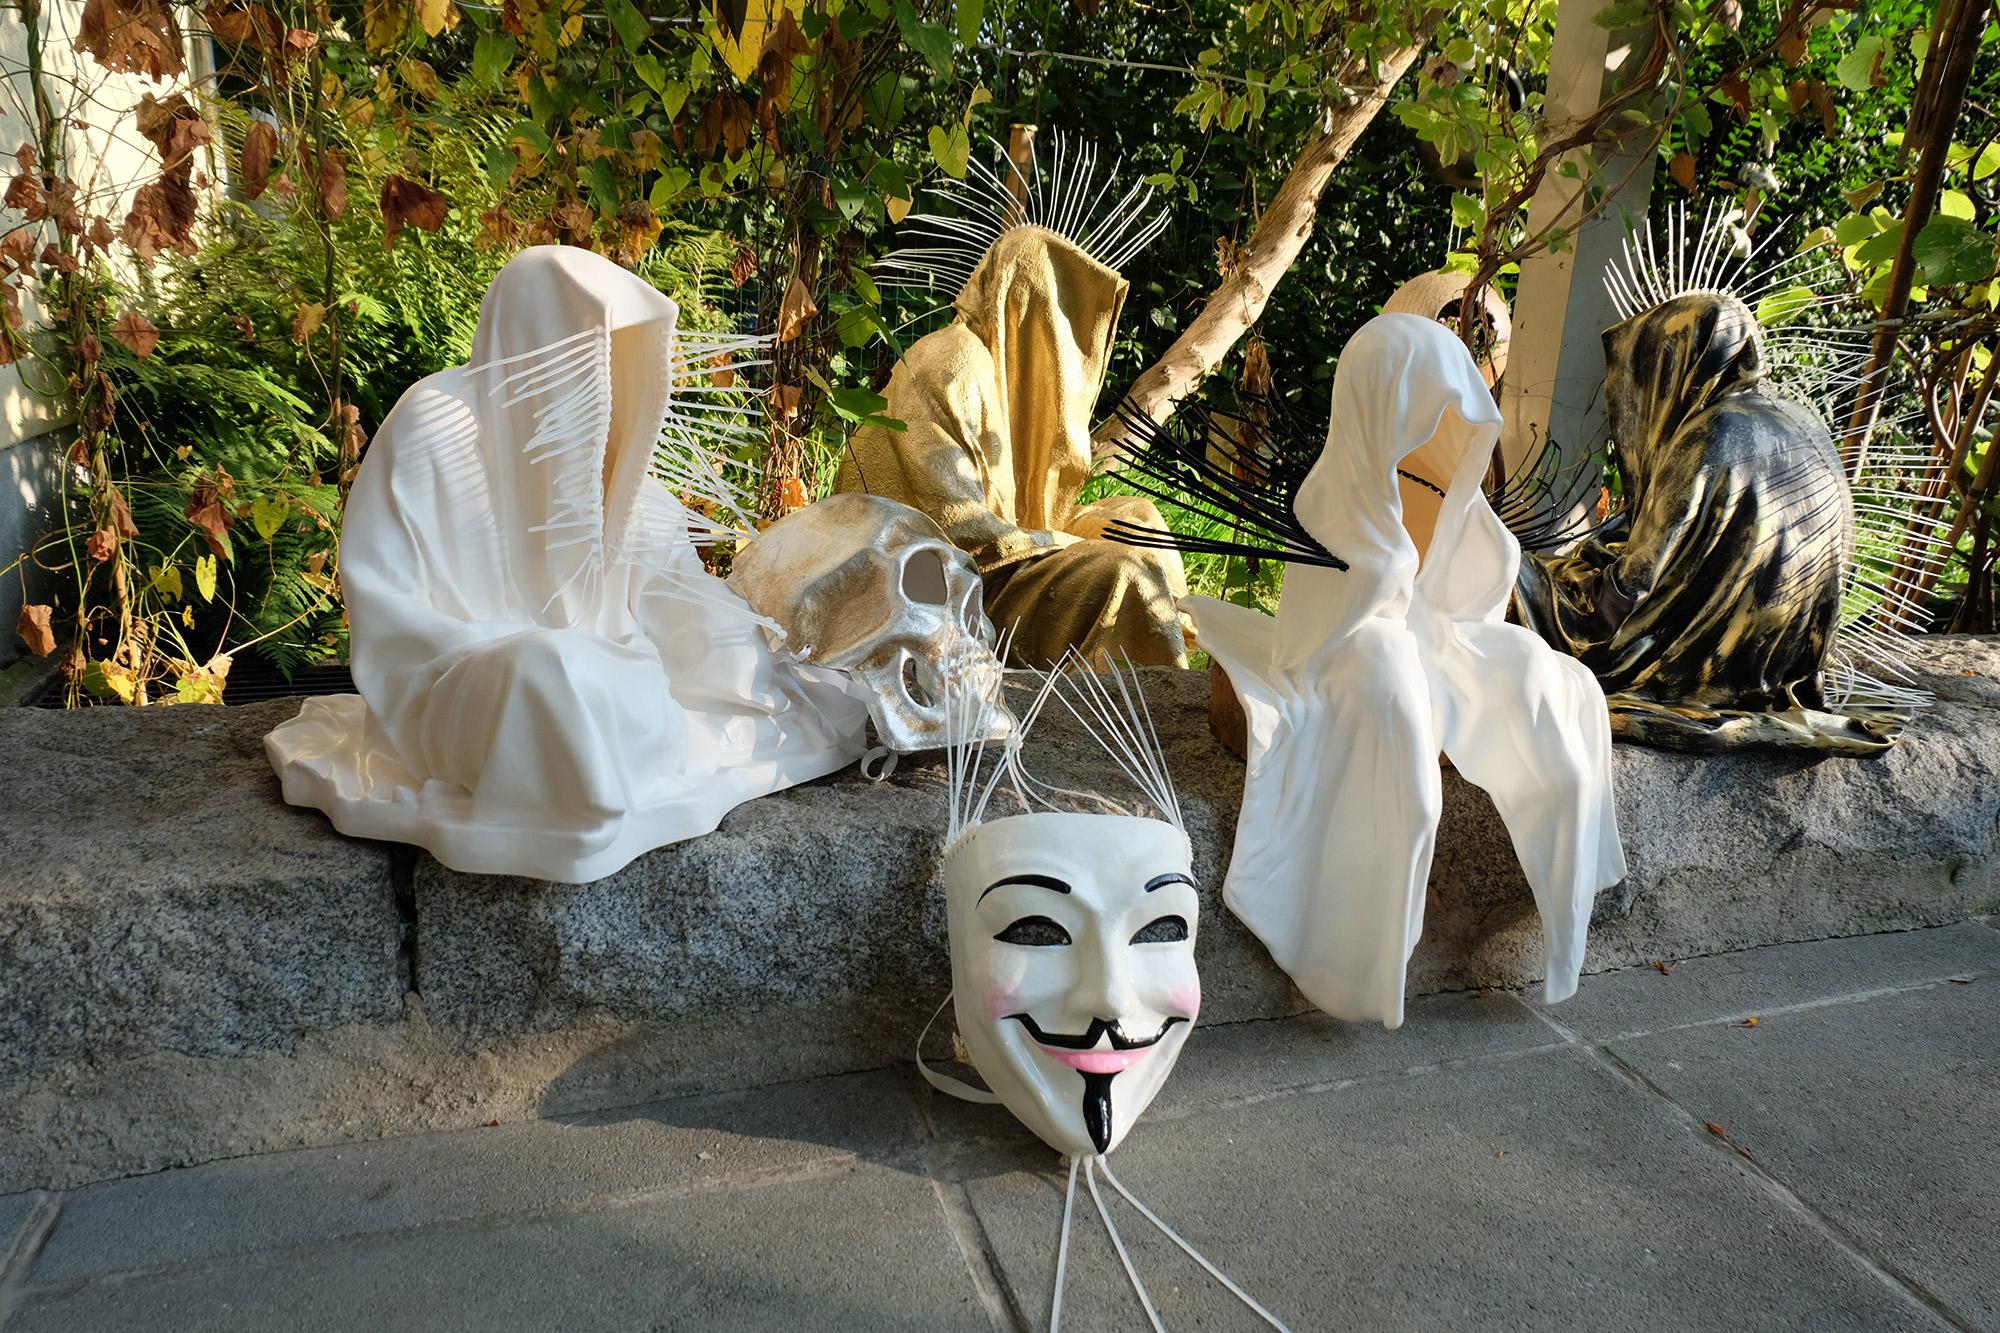 #faceless-#mask-#cableties-#ziptie-ty-#guardiansoftime-#manfredkielnhofer-#contemporaryart-#arts-#design-#sculpture-#statue-#museum-#gallery-#fineart-#lightart-#ghost-#anonymous-8137